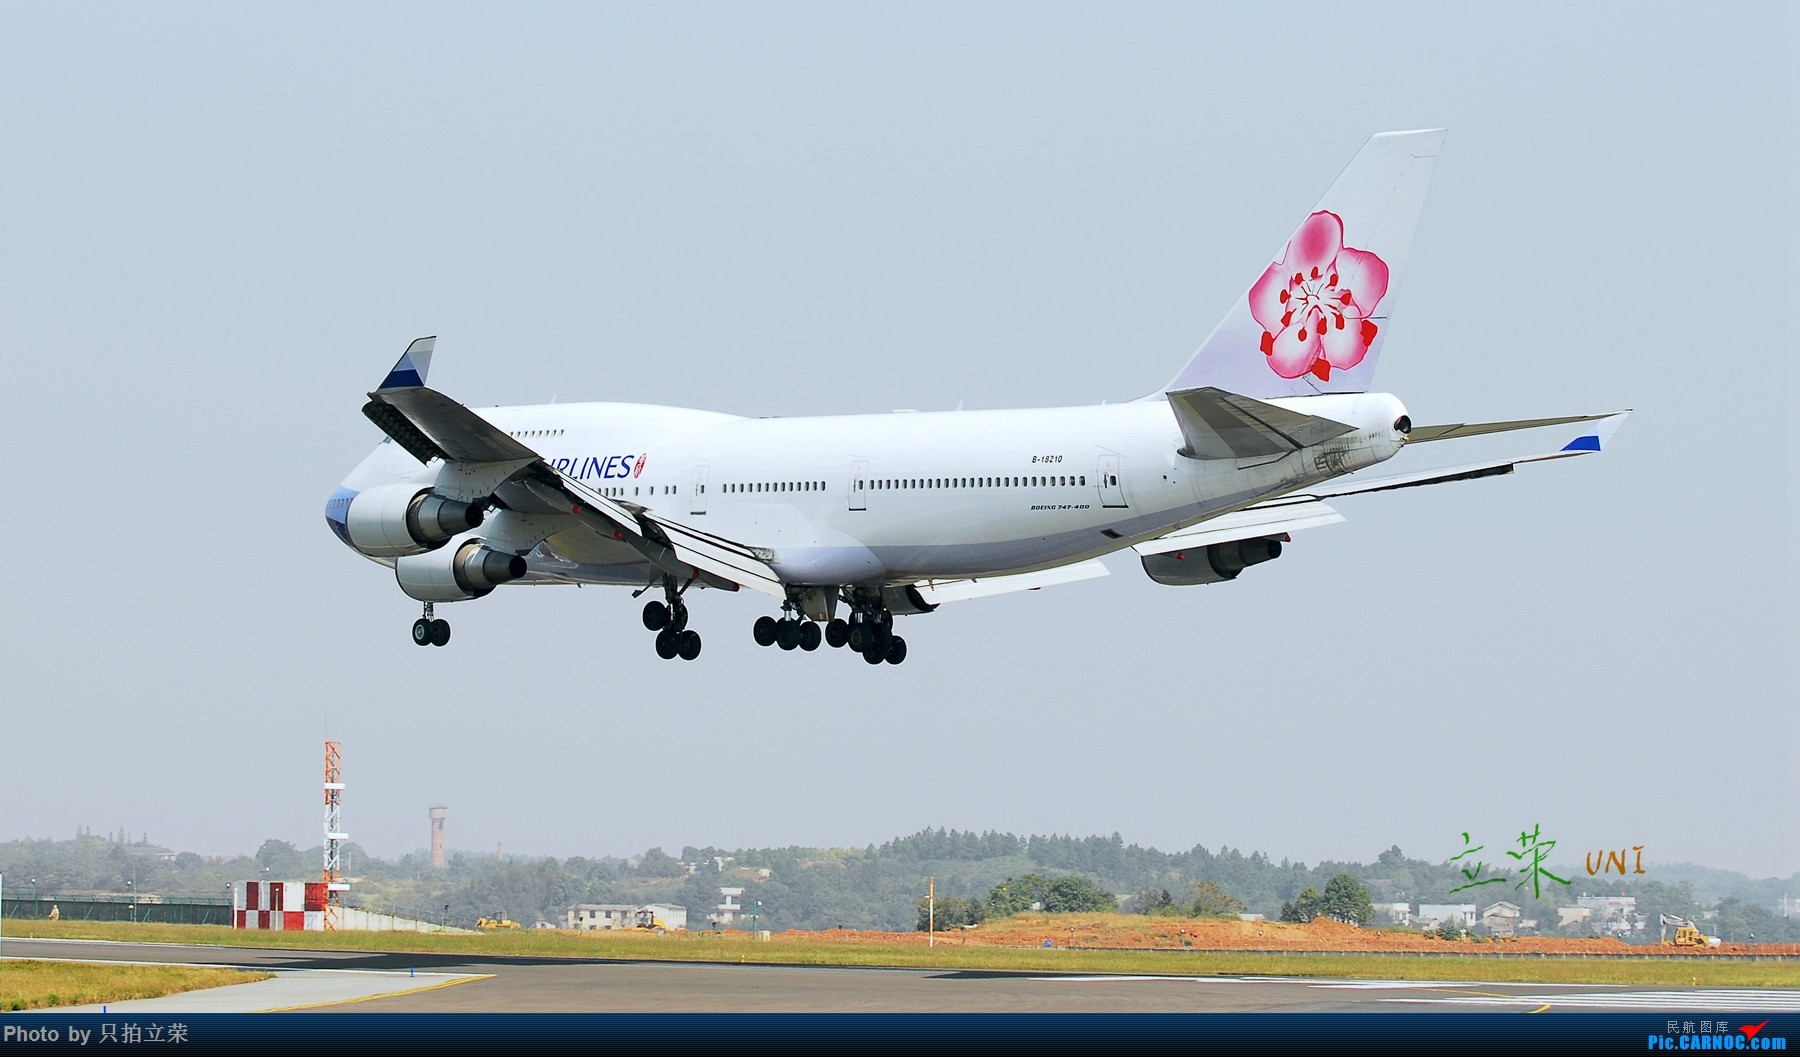 Re:[原创]第一次发图,长沙的大梅花们 BOEING 747-400 B-18210 中国长沙黄花国际机场